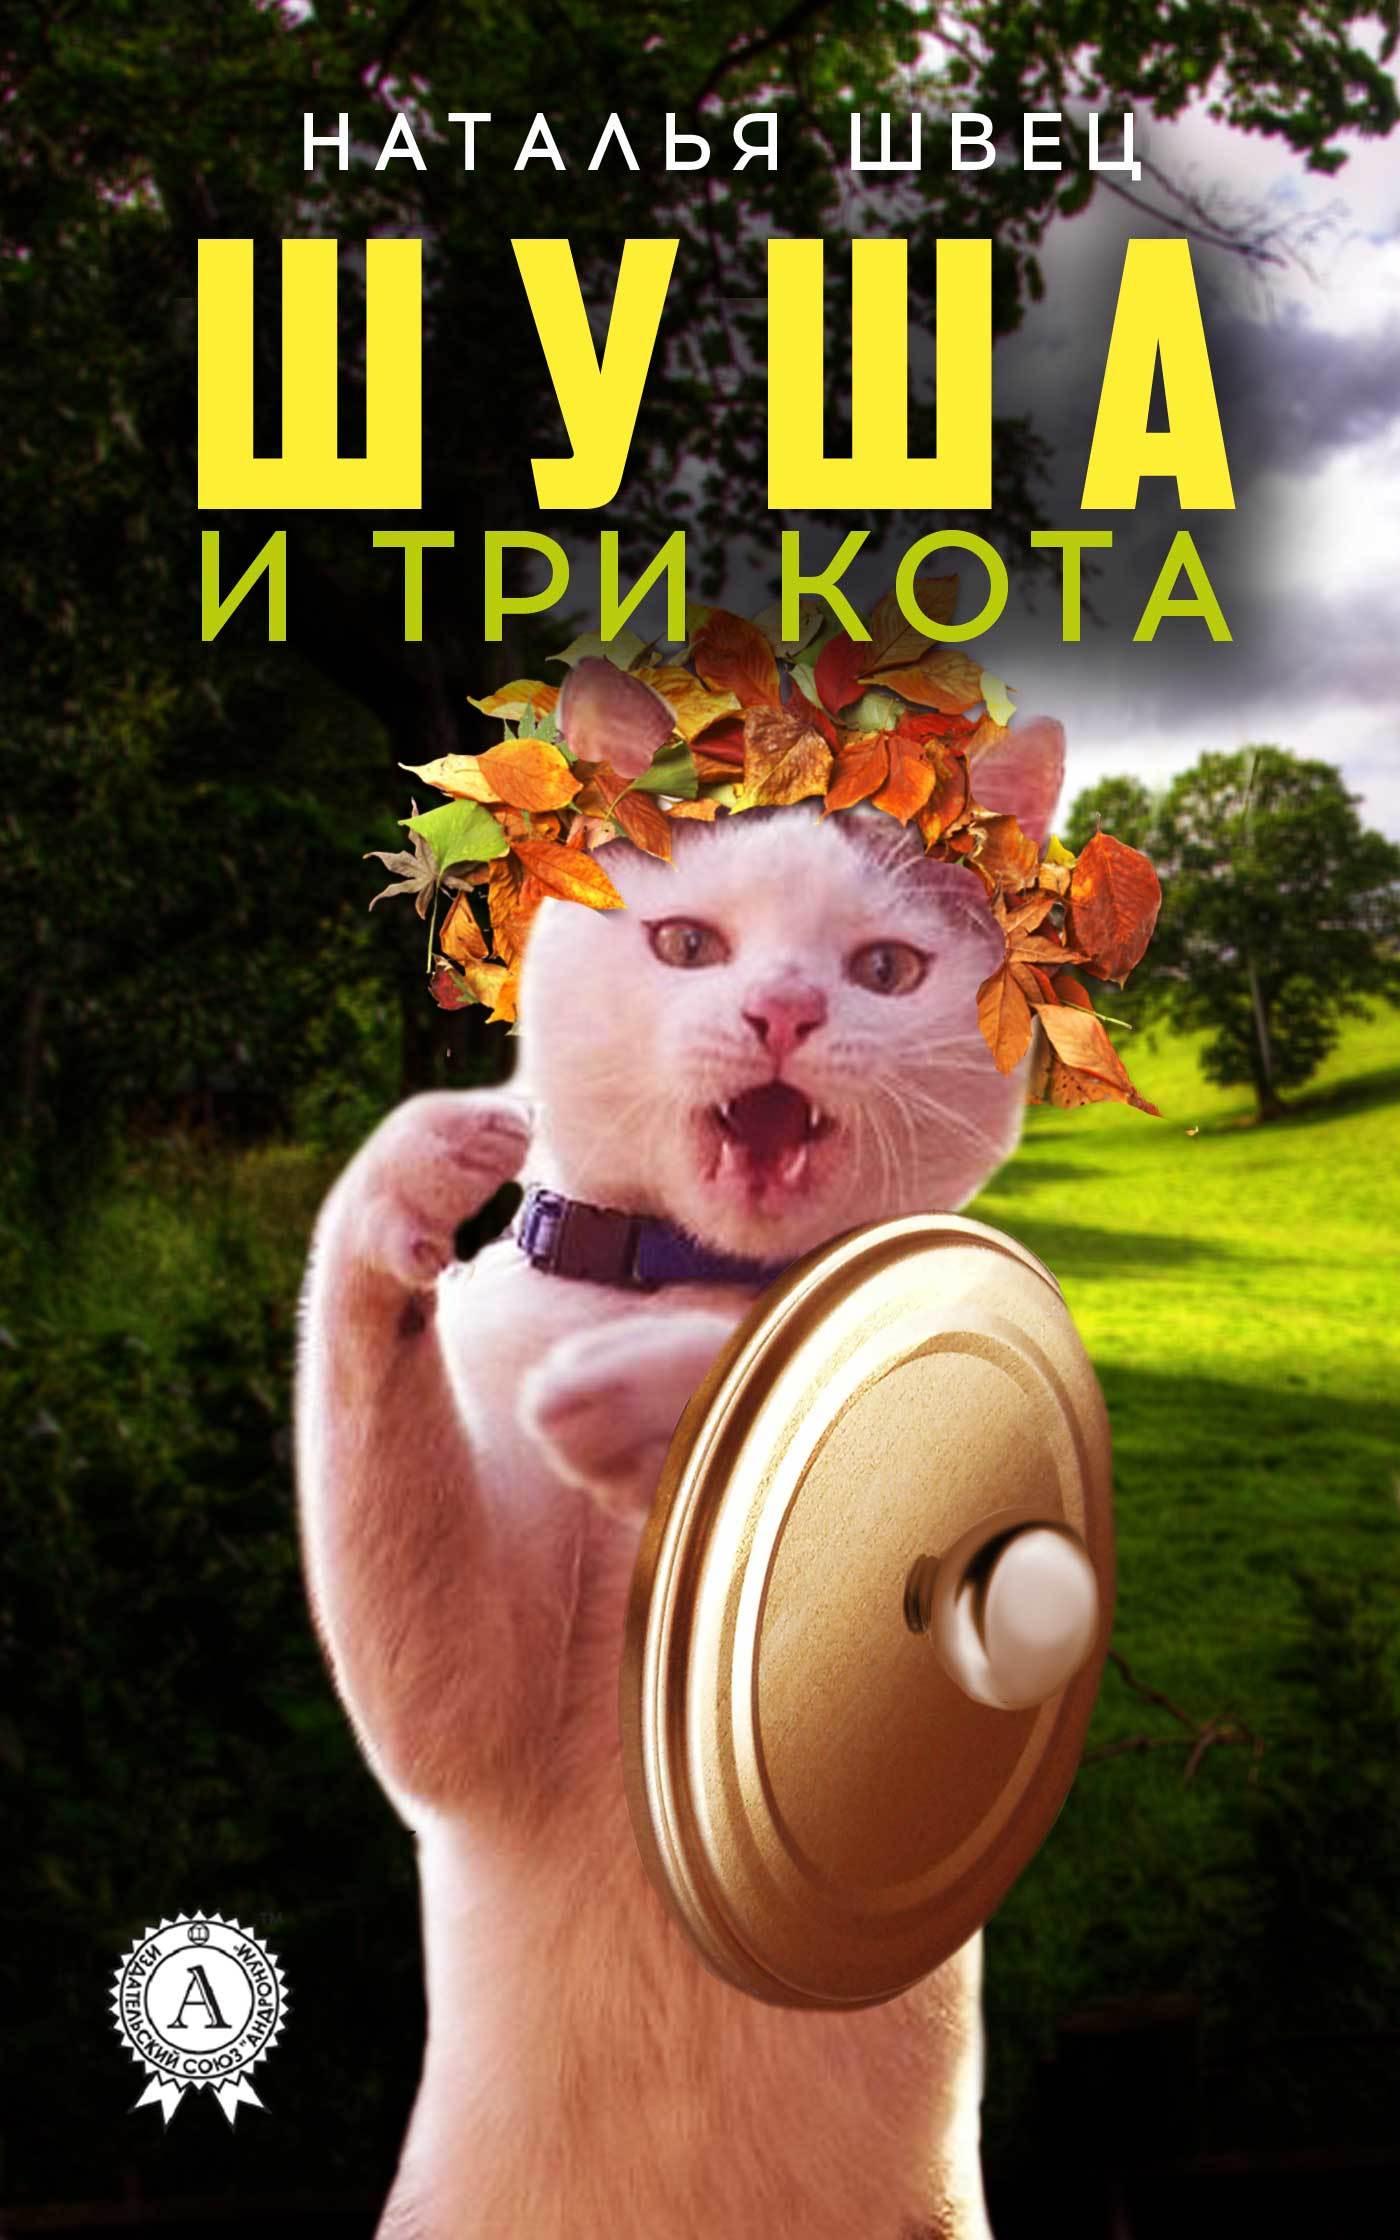 Наталья Швец. Шуша и три кота